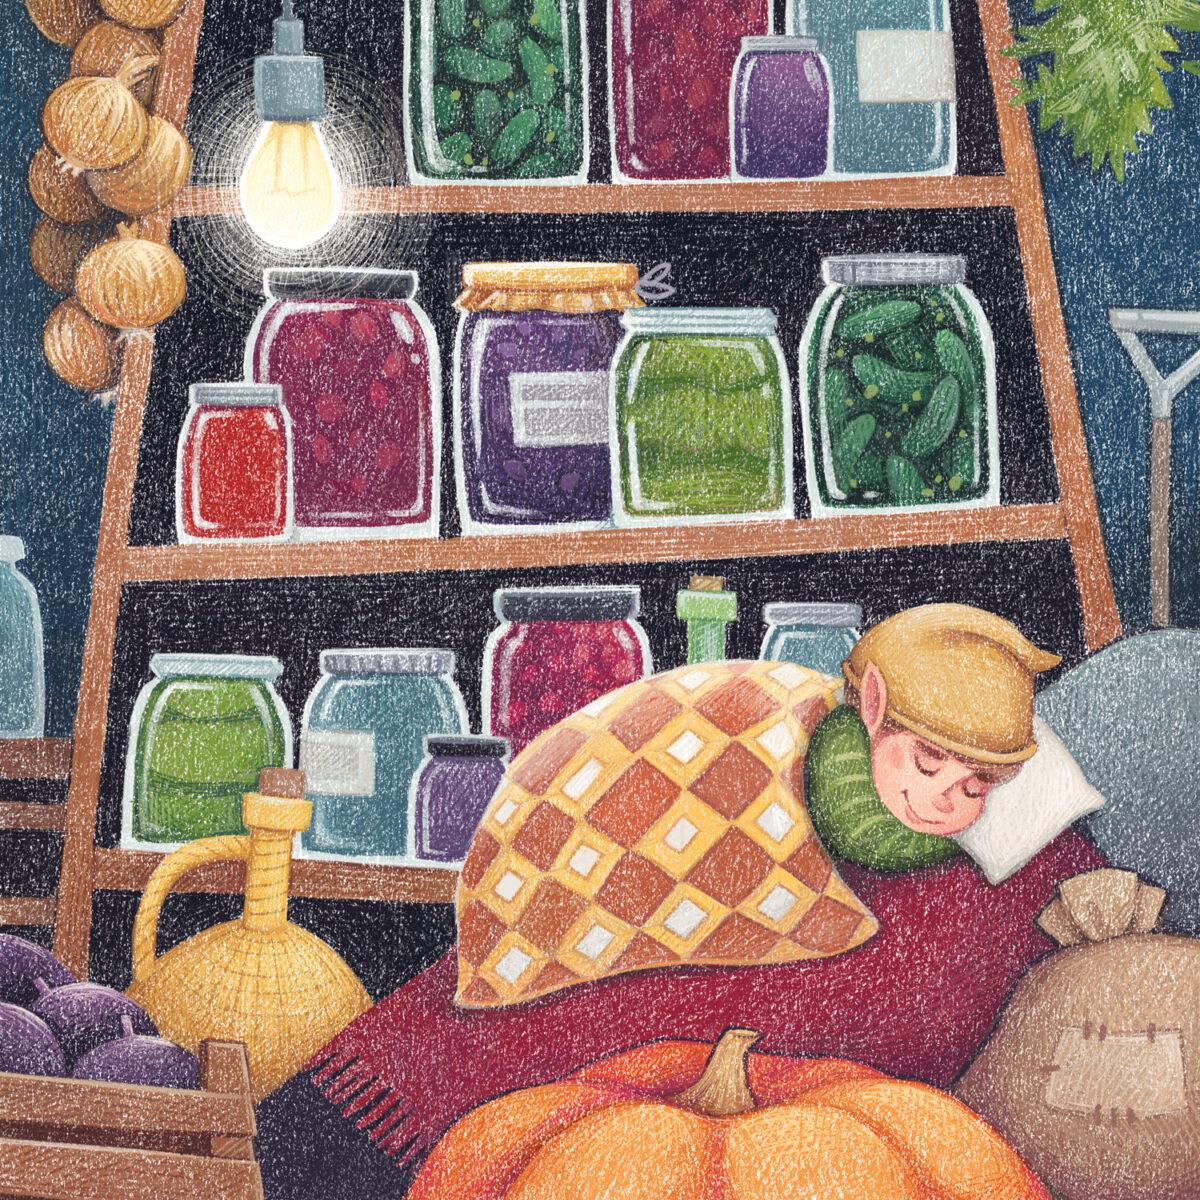 House Elf October - children's illustration by Margarita Levina